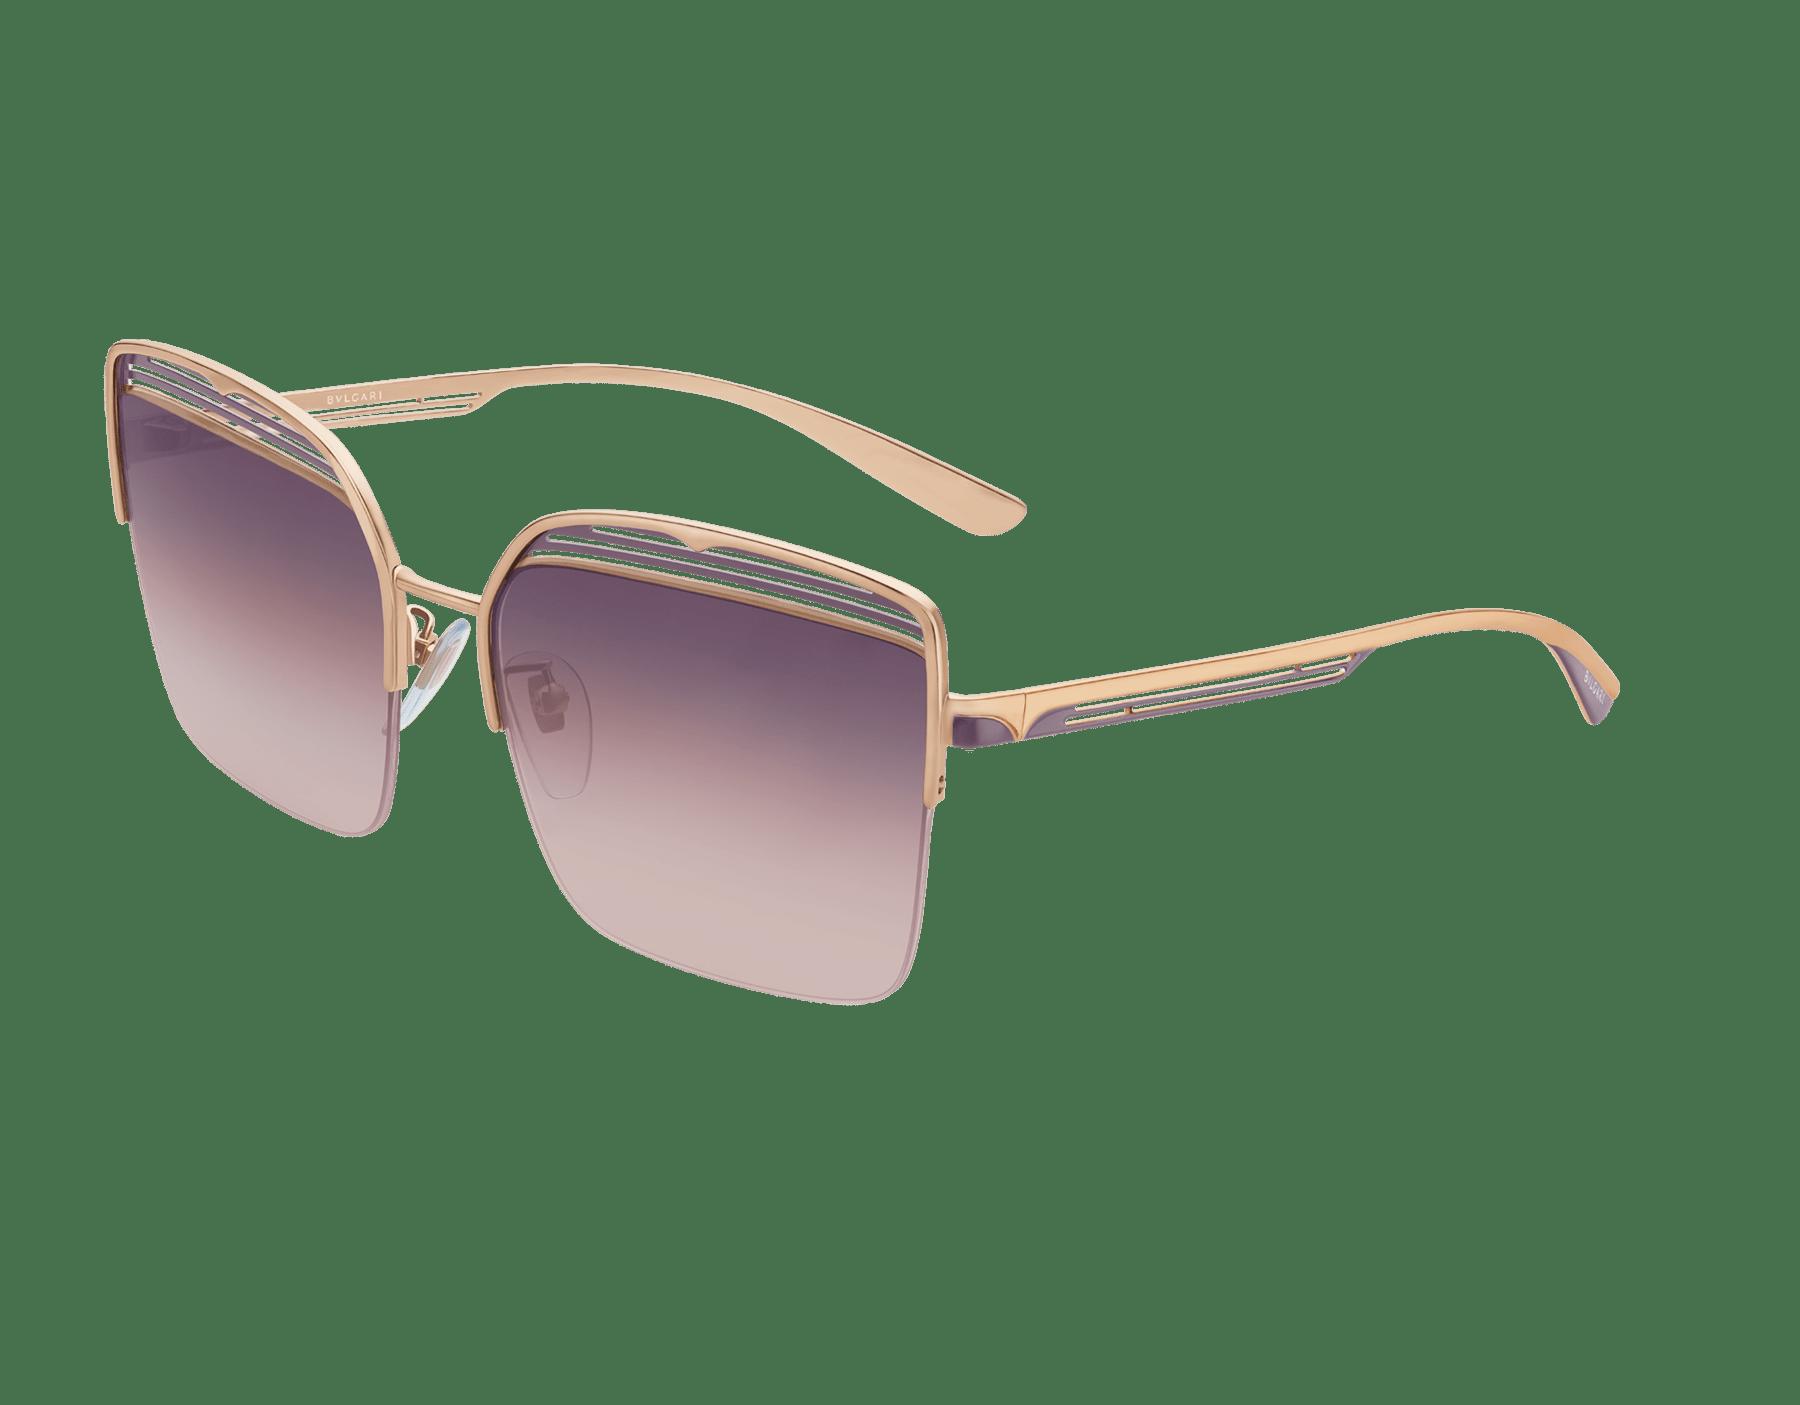 Bvlgari B.zero1 B.overvibe half-rim square metal sunglasses. 903813 image 1